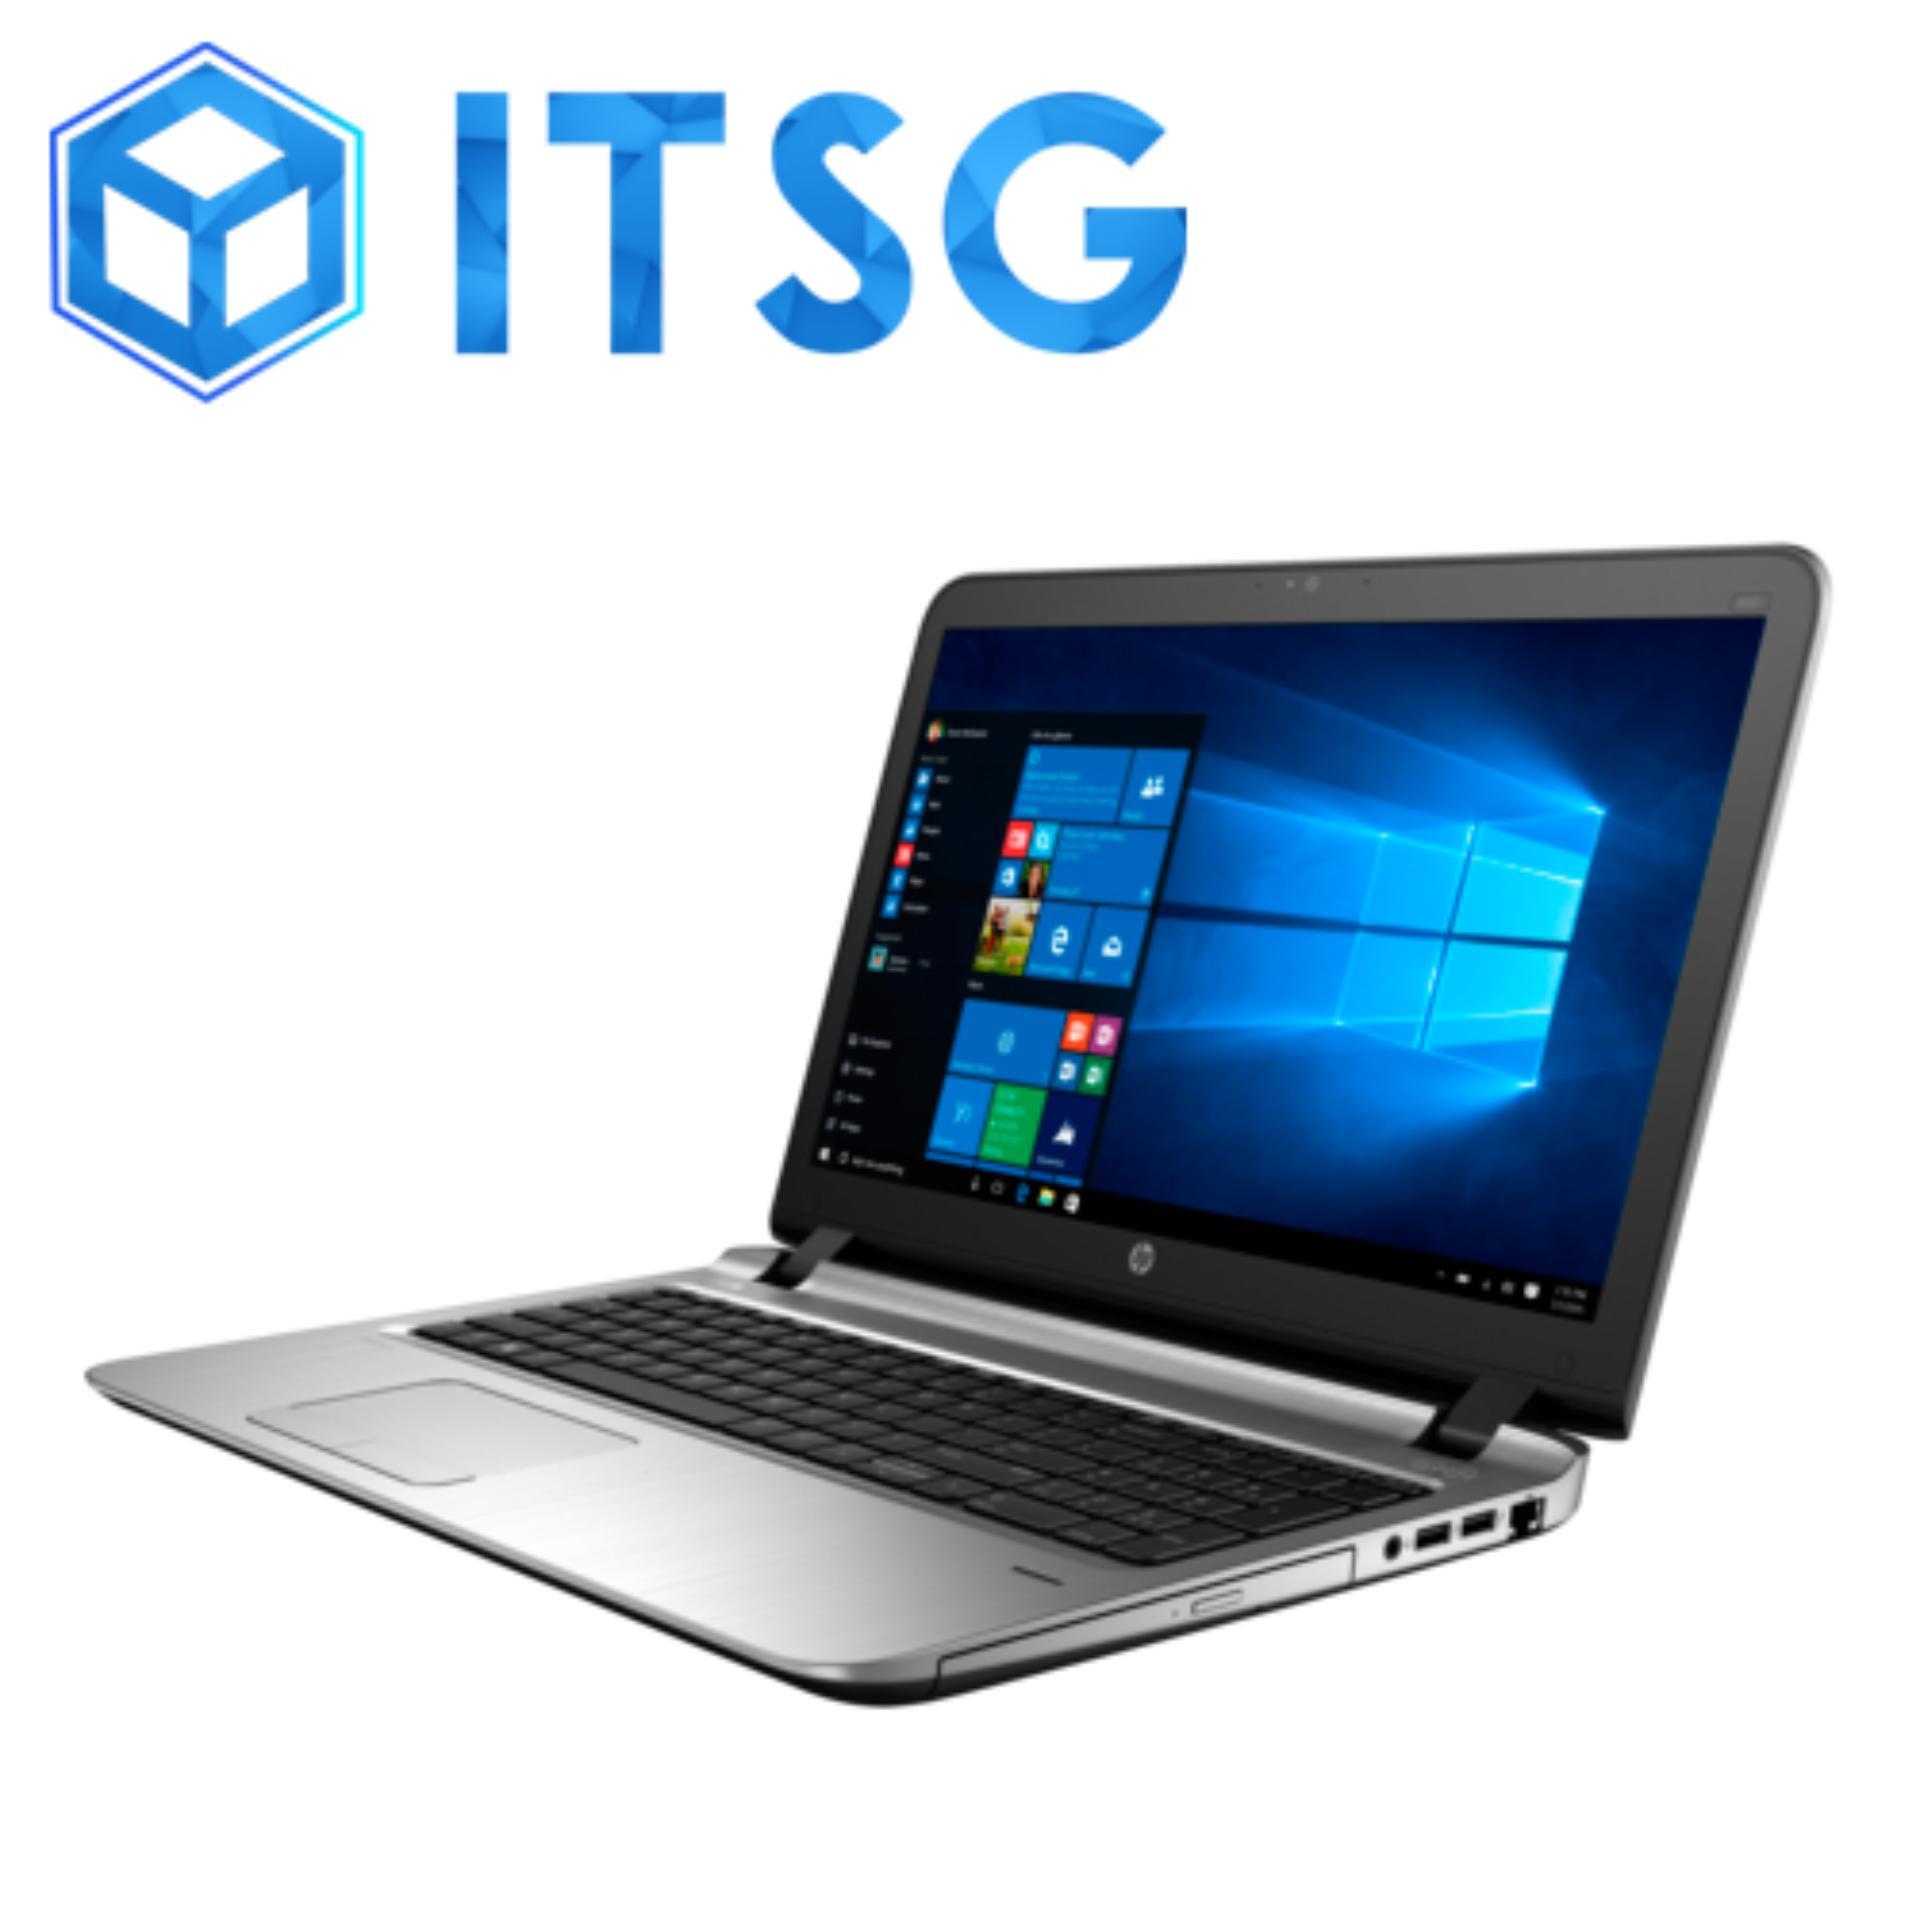 HP PROBOOK 450 G5 i5 (Genuine Windows® 10 Pro) / Laptop / Notebook / Computer / Home Use / Business Use / Windows / 15.6″ / Best Seller / Top Seller / Portable / Workstation